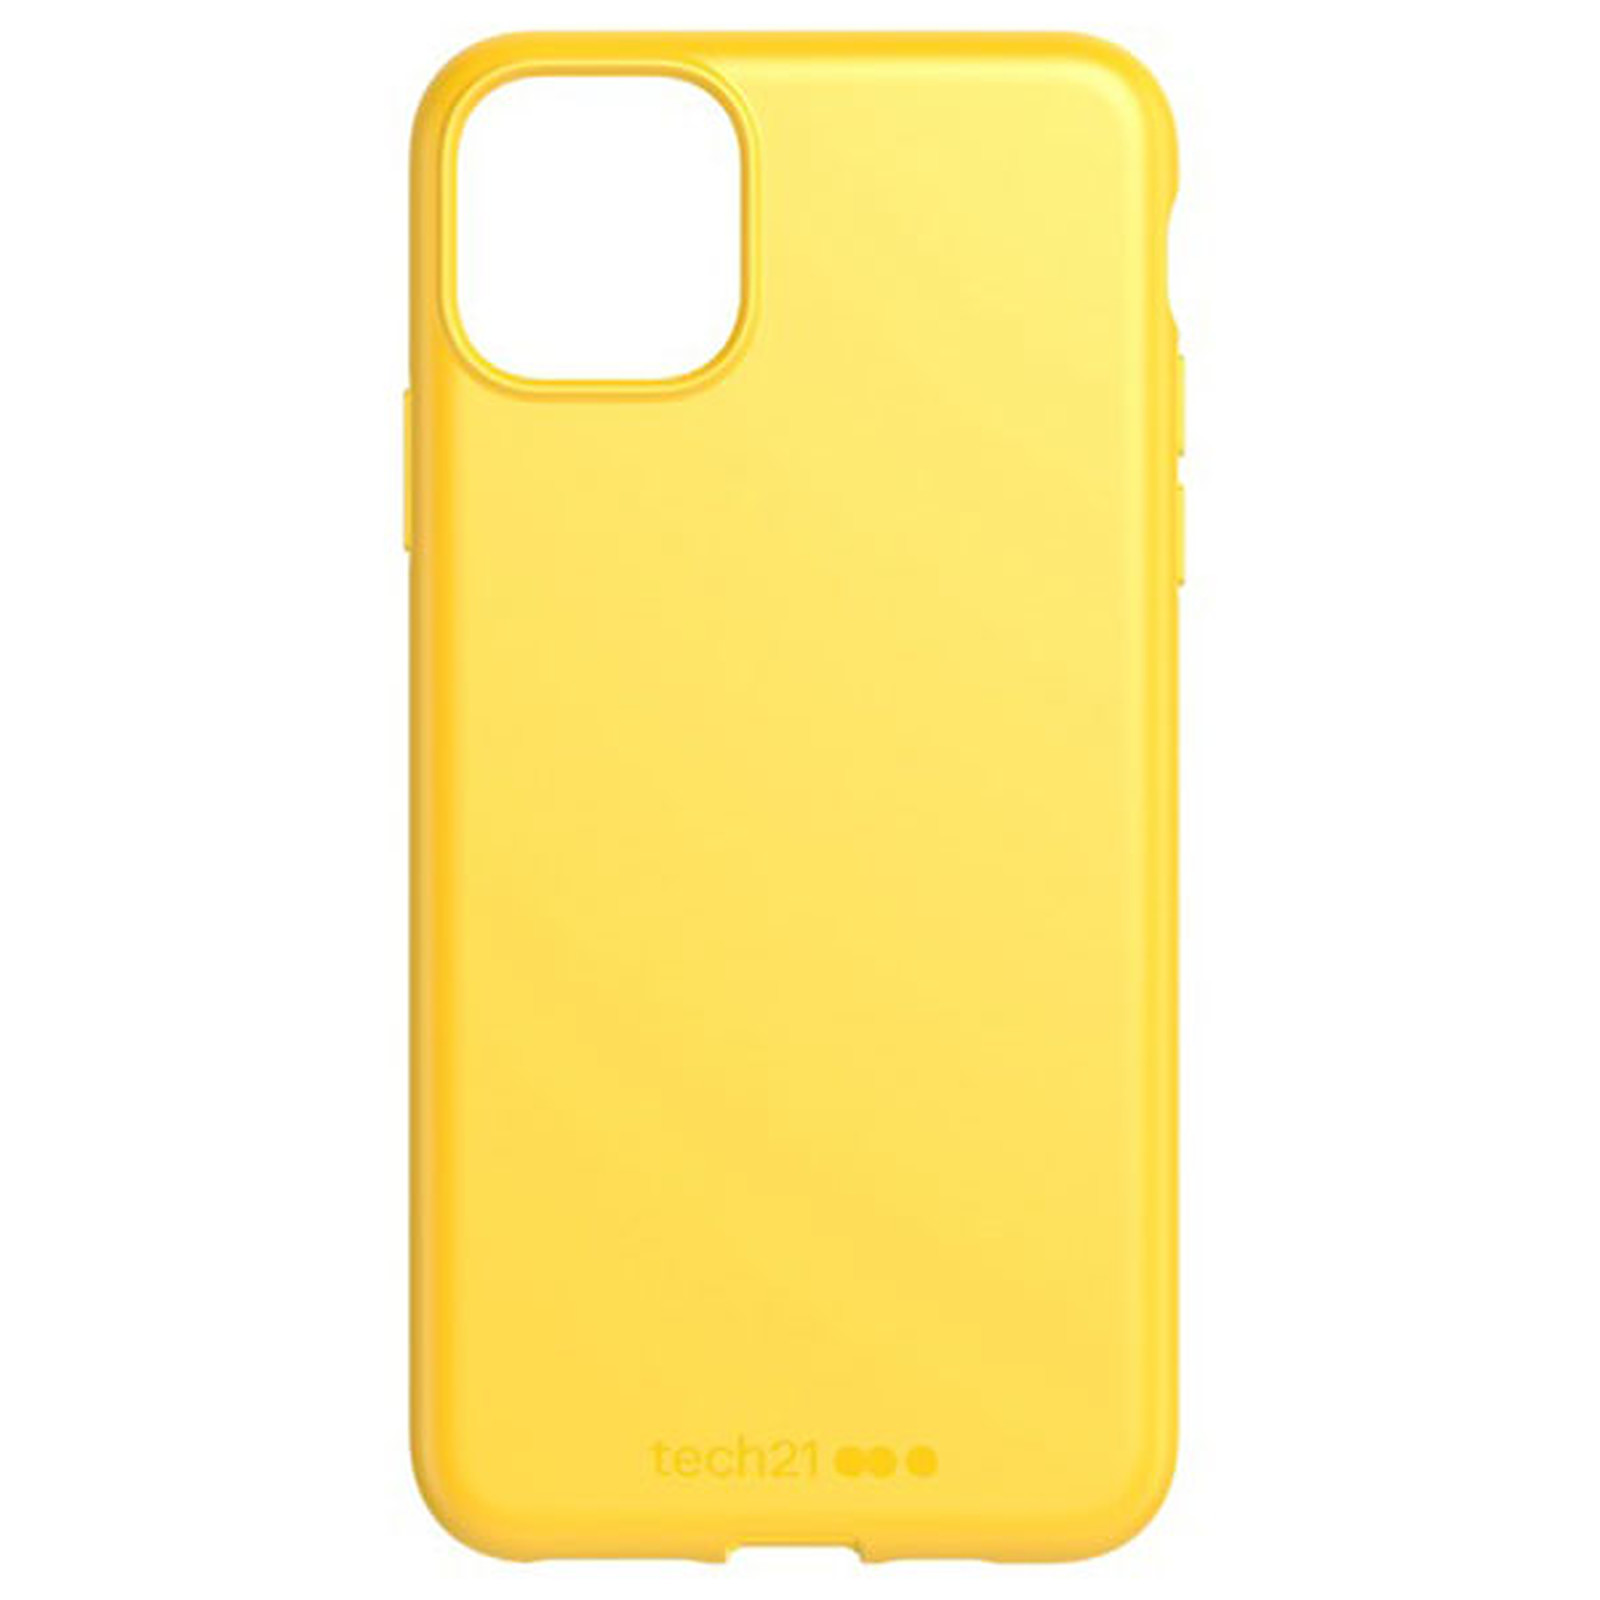 Tech21 Studio Colour Jaune Apple iPhone 11 Pro Max